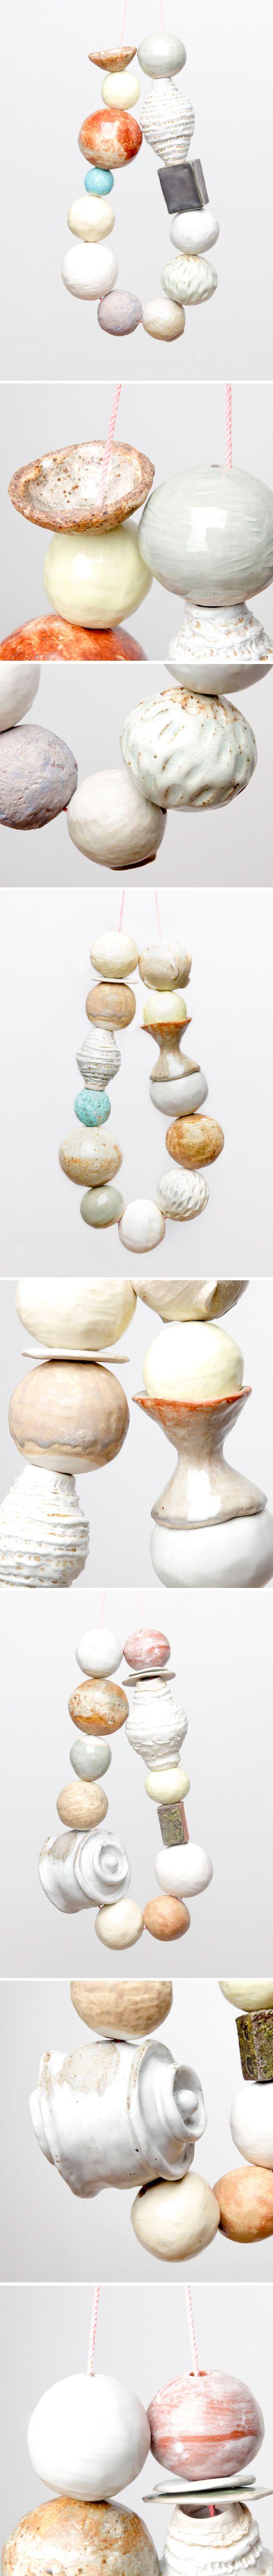 3foot cermaic necklace by Katy Krantz